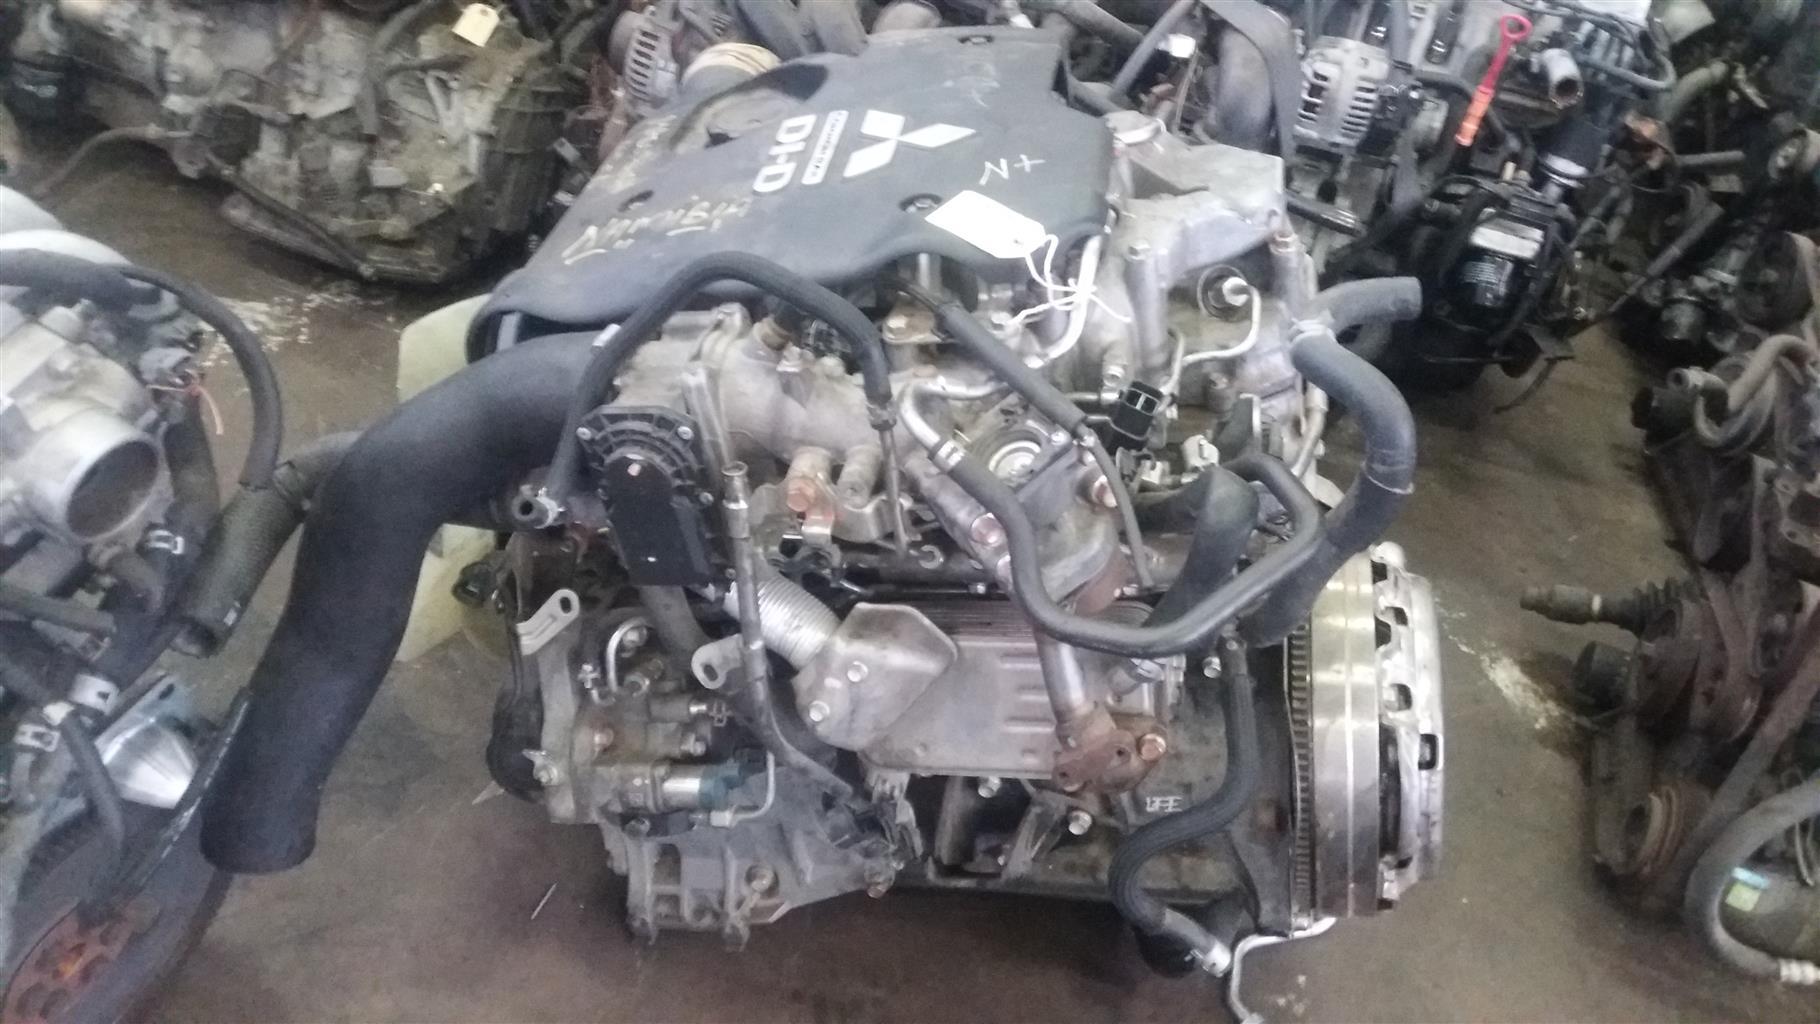 Mitsubishi Triton 2.5 TDi Engine # 4D56U